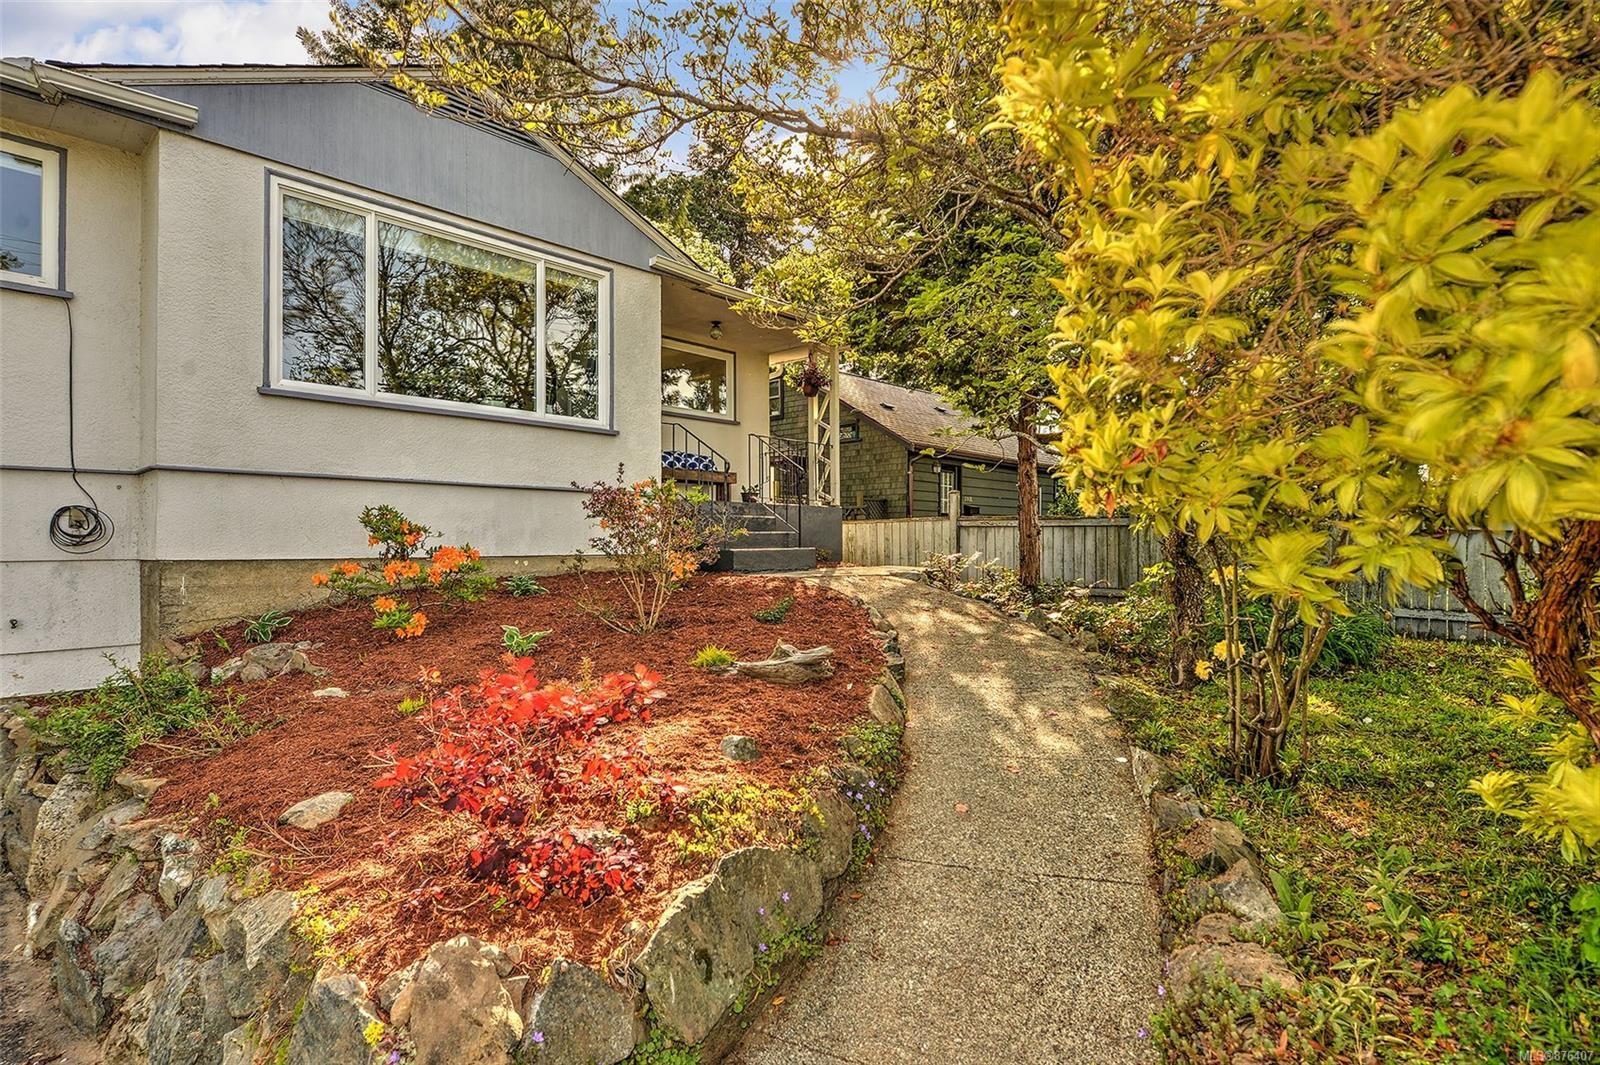 Photo 2: Photos: 631 Cowper St in Saanich: SW Gorge House for sale (Saanich West)  : MLS®# 876407